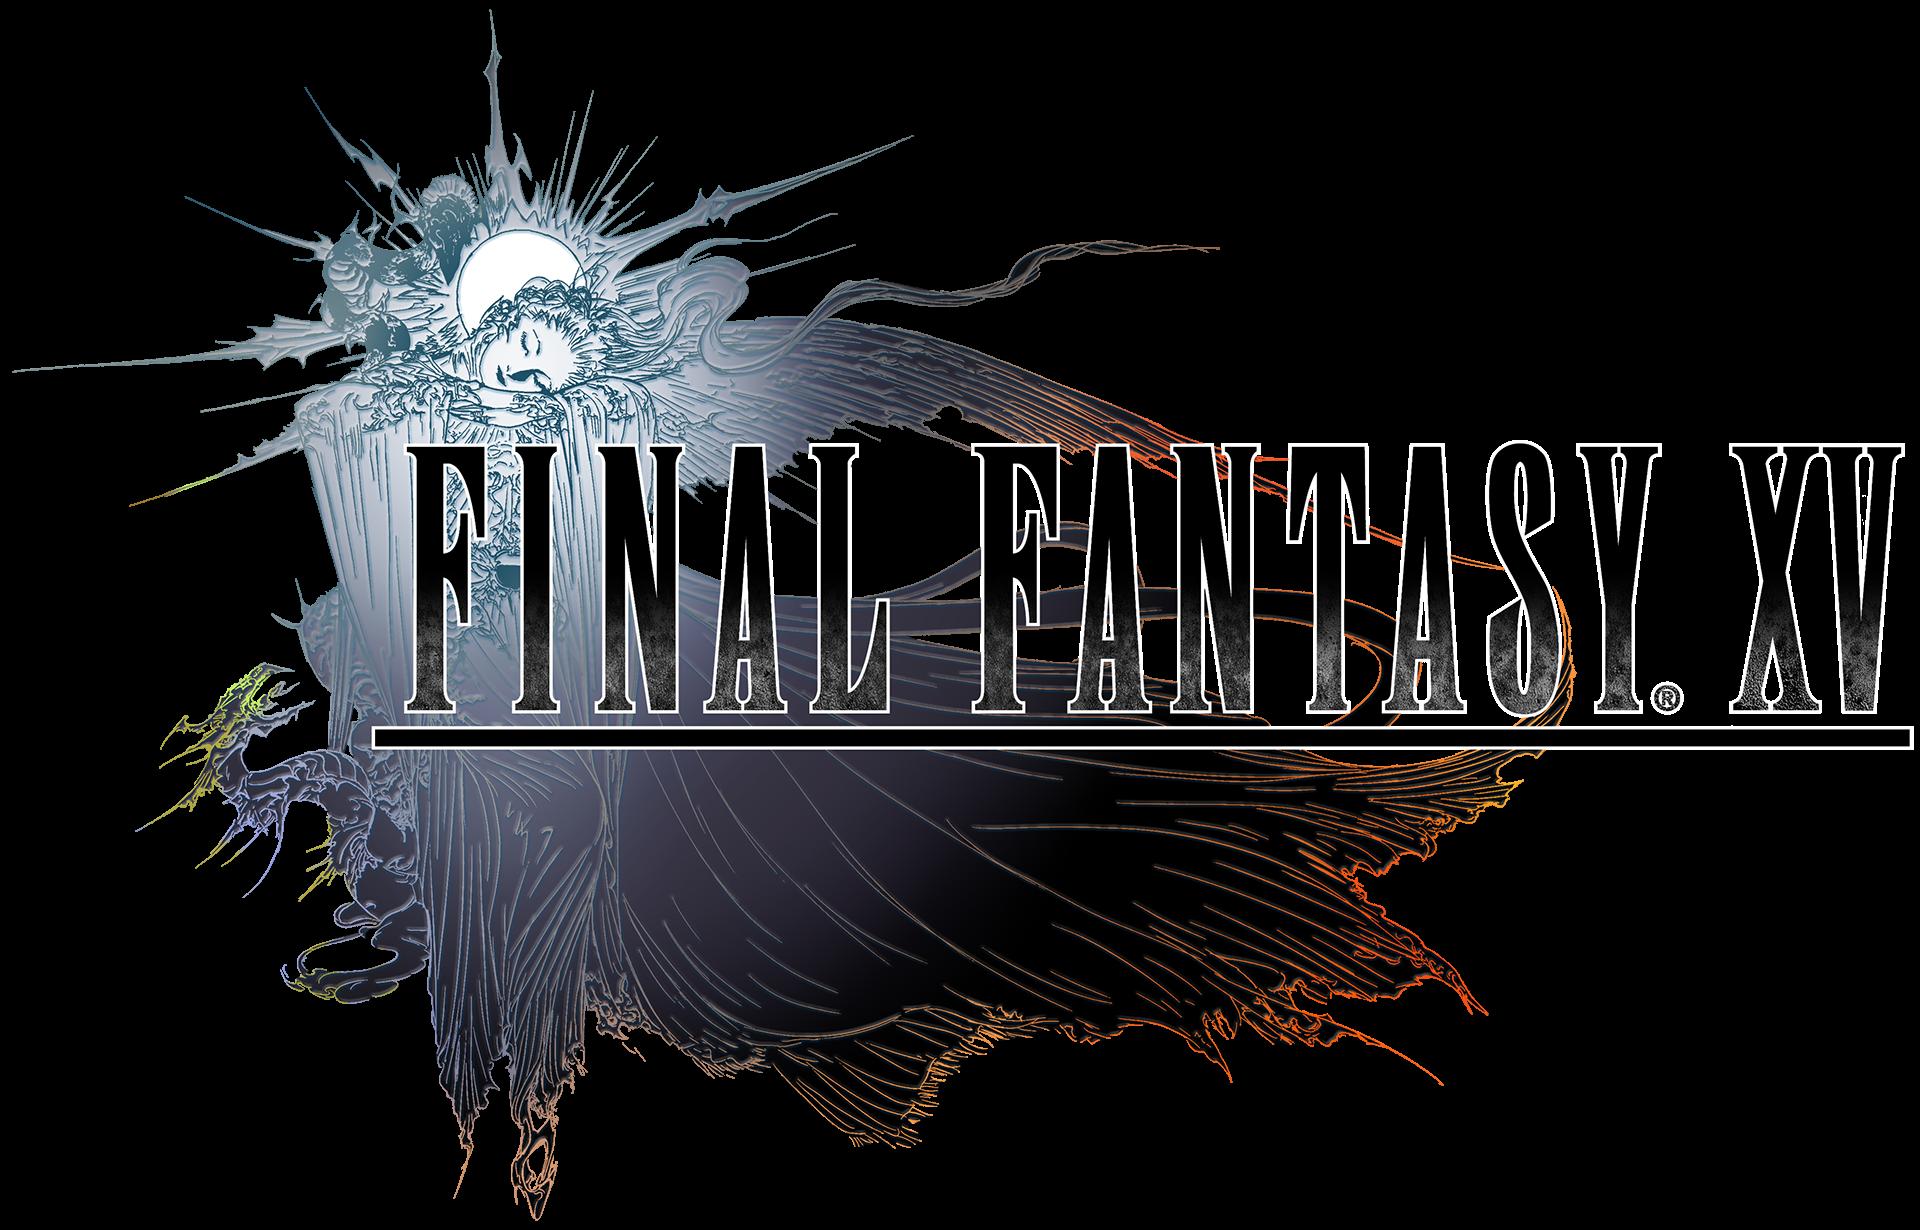 Final Fantasy XV serait encore reporté